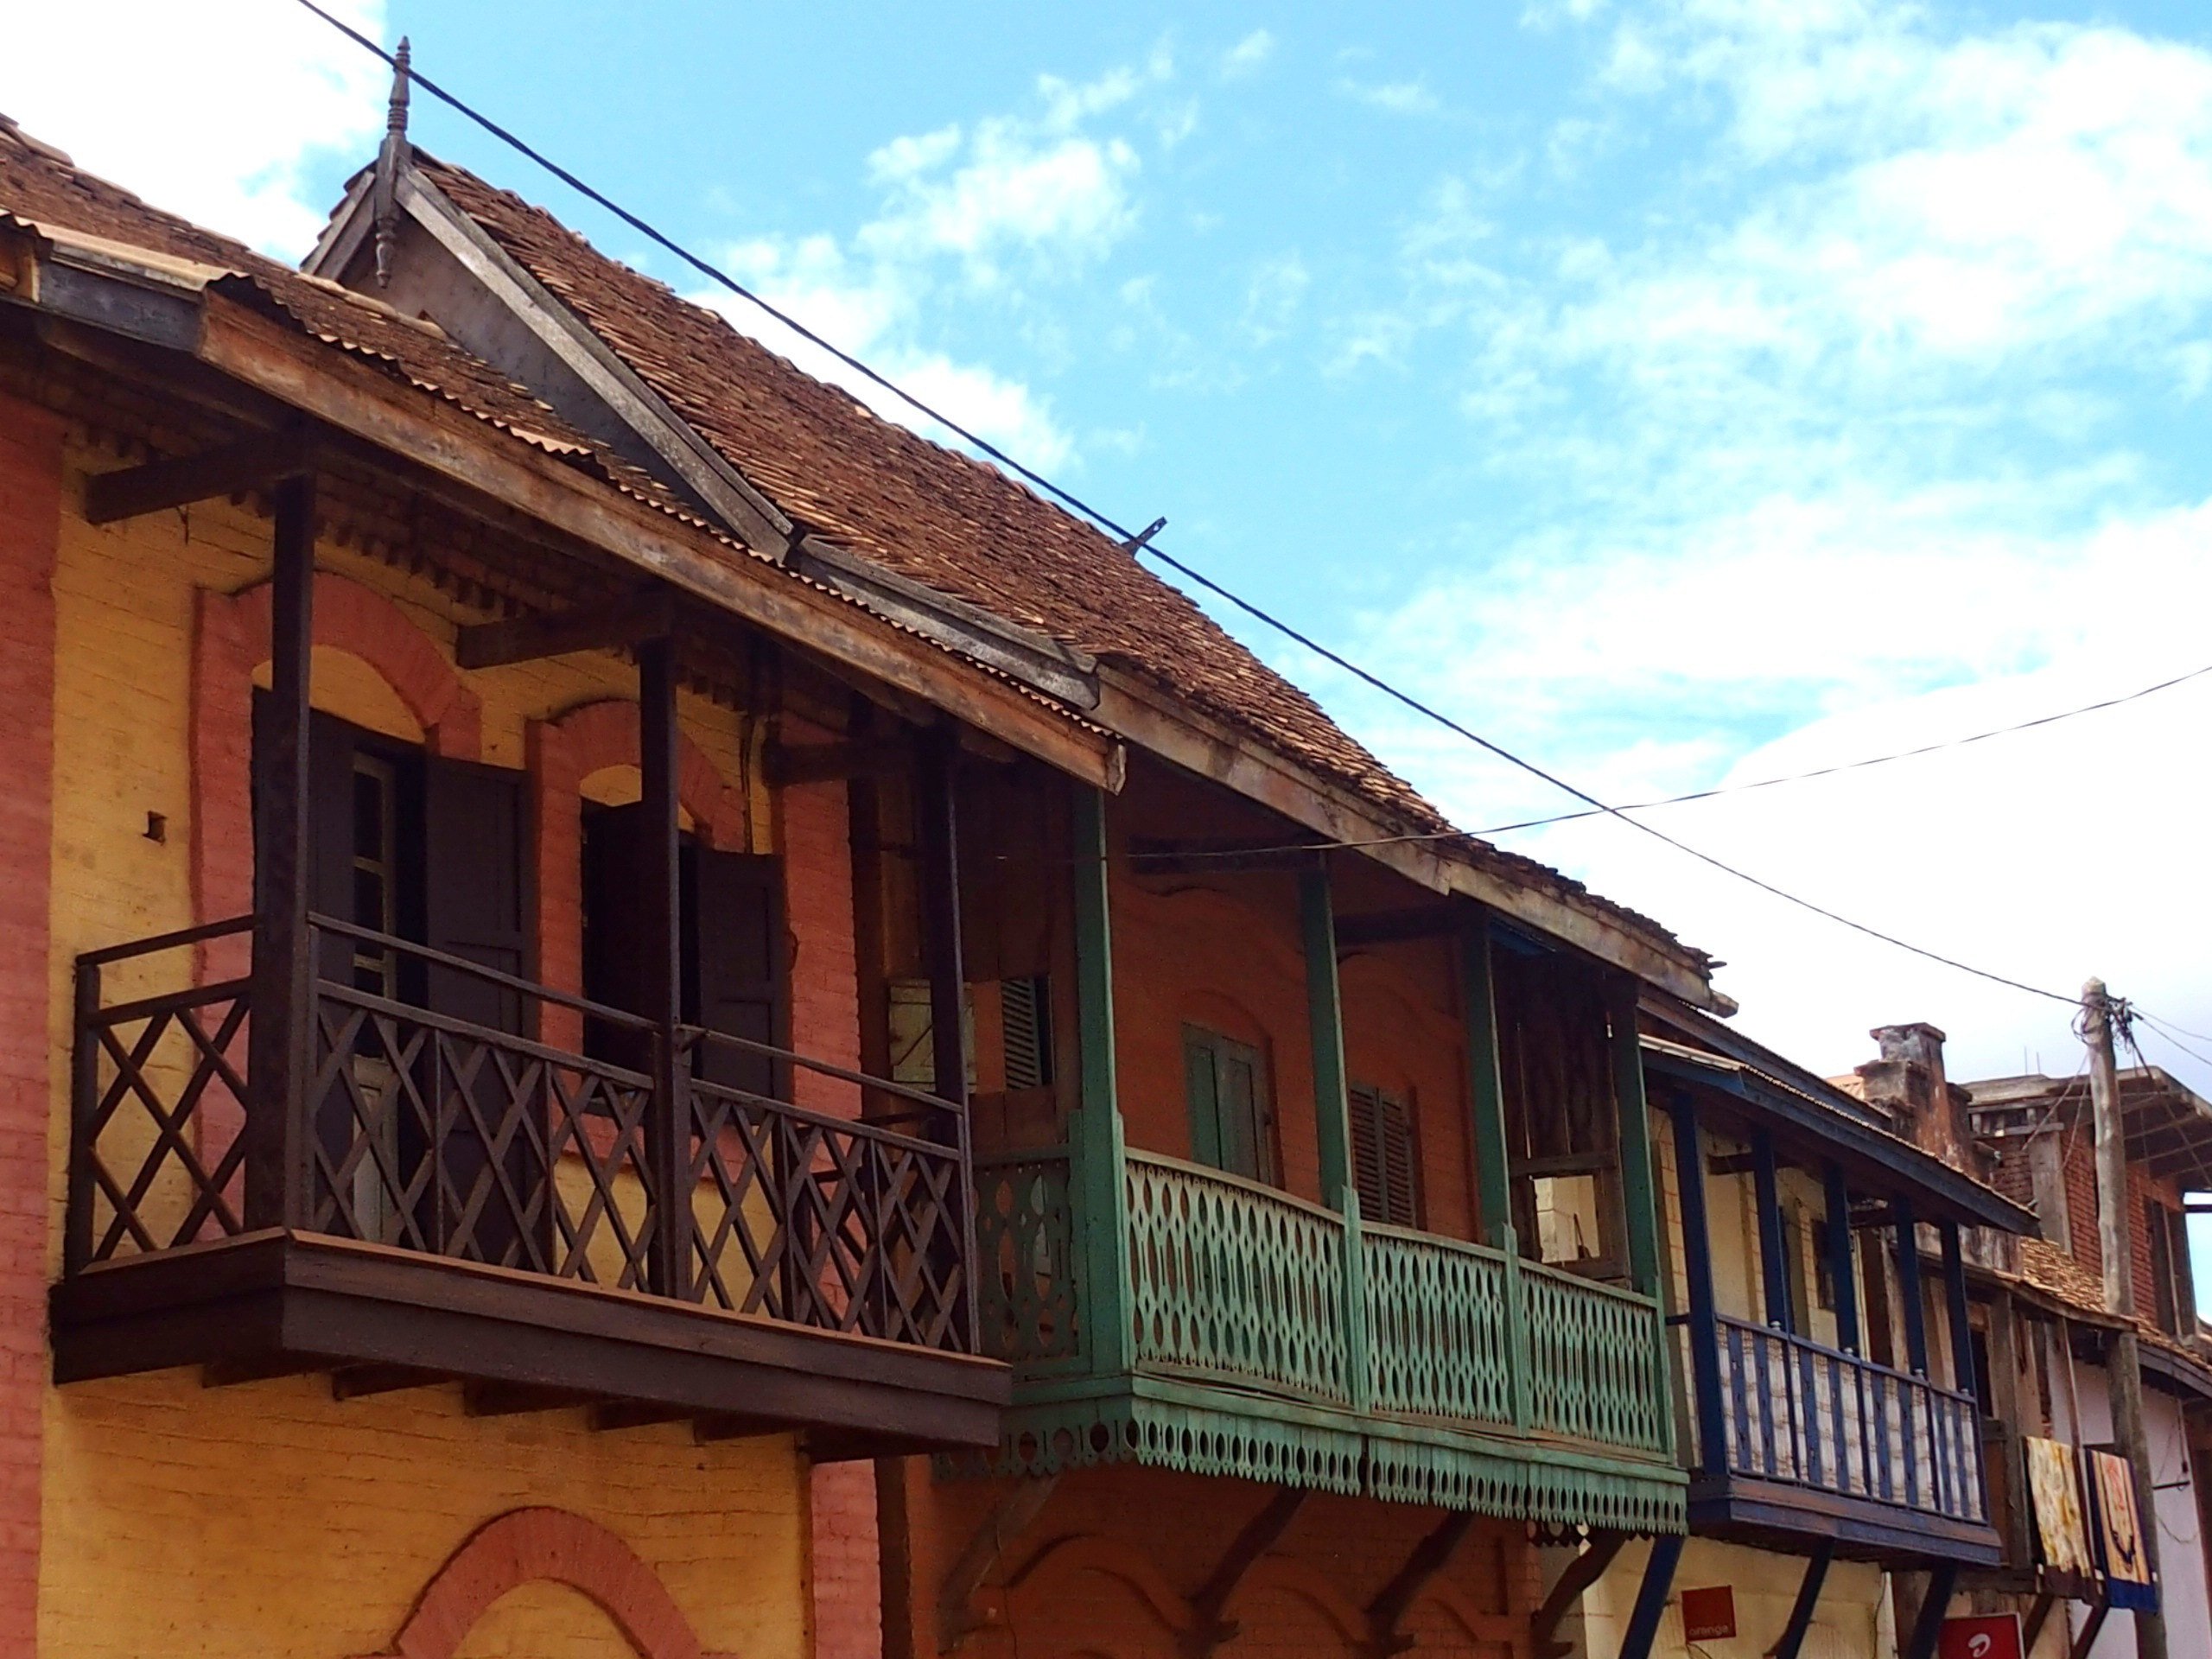 Maisons colorées Ambalavao Madagascar